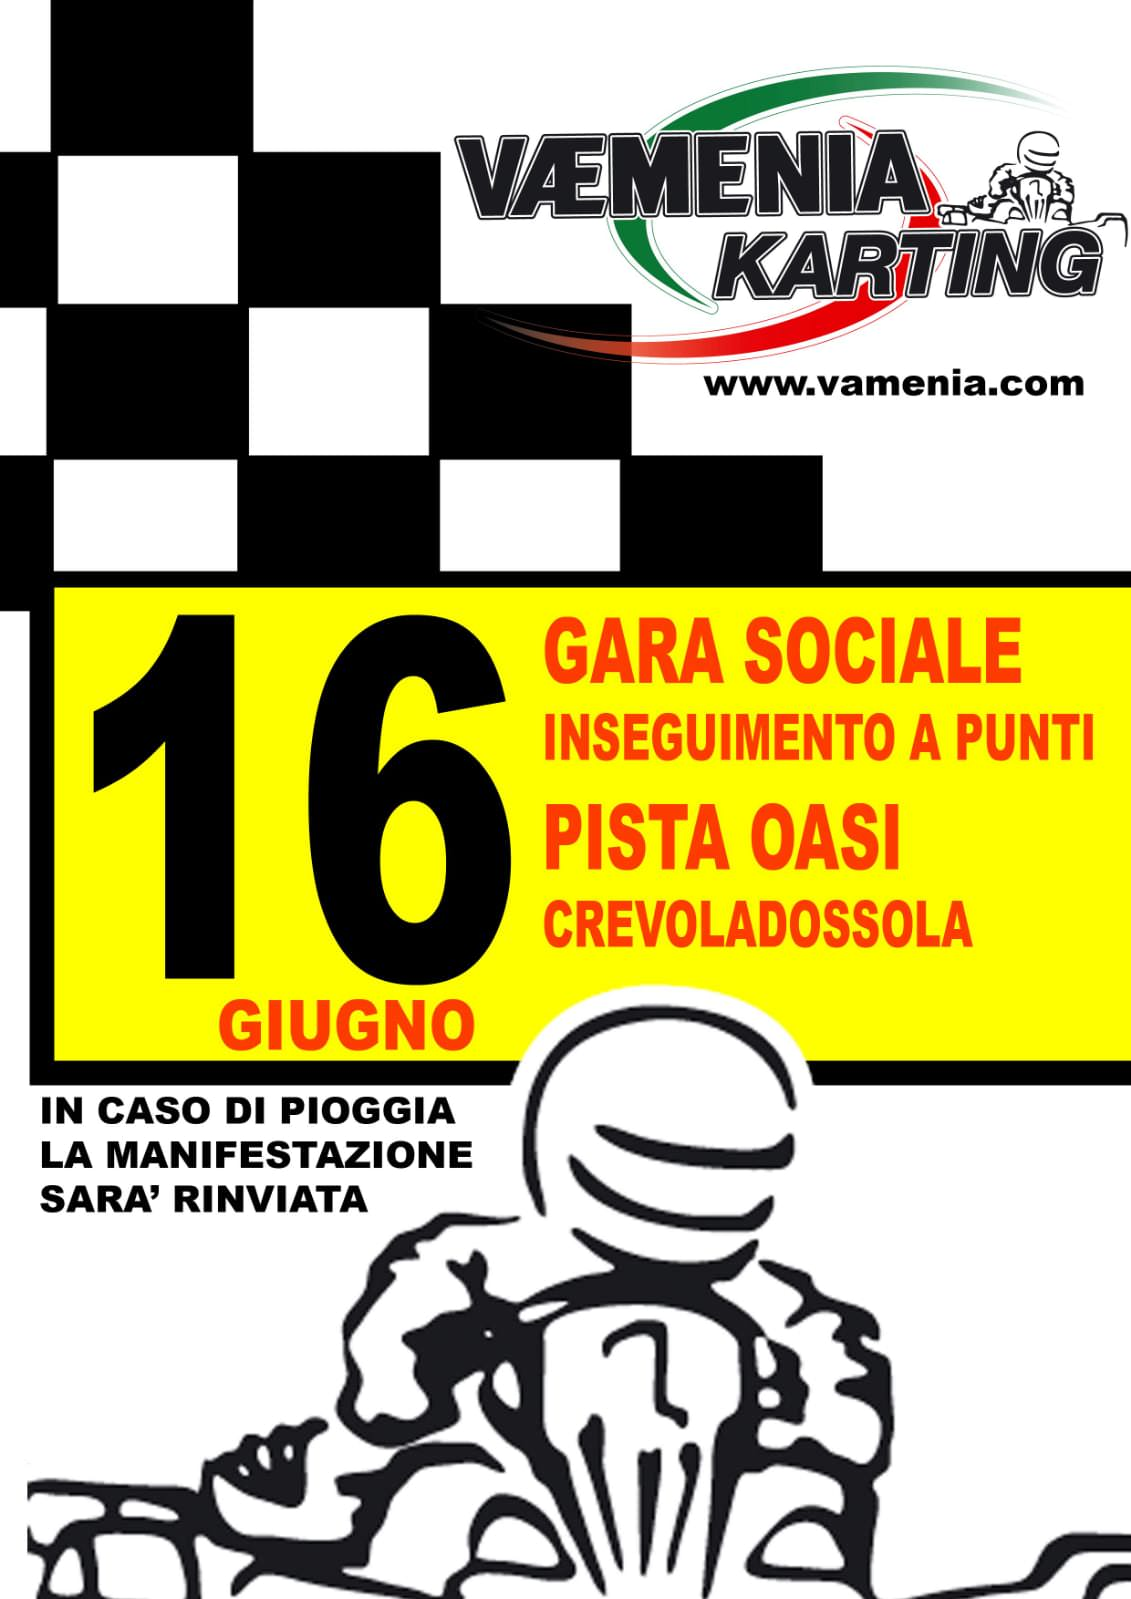 Gara Sociale – Pista Oasi, Crevoladossola (1 – 2019)